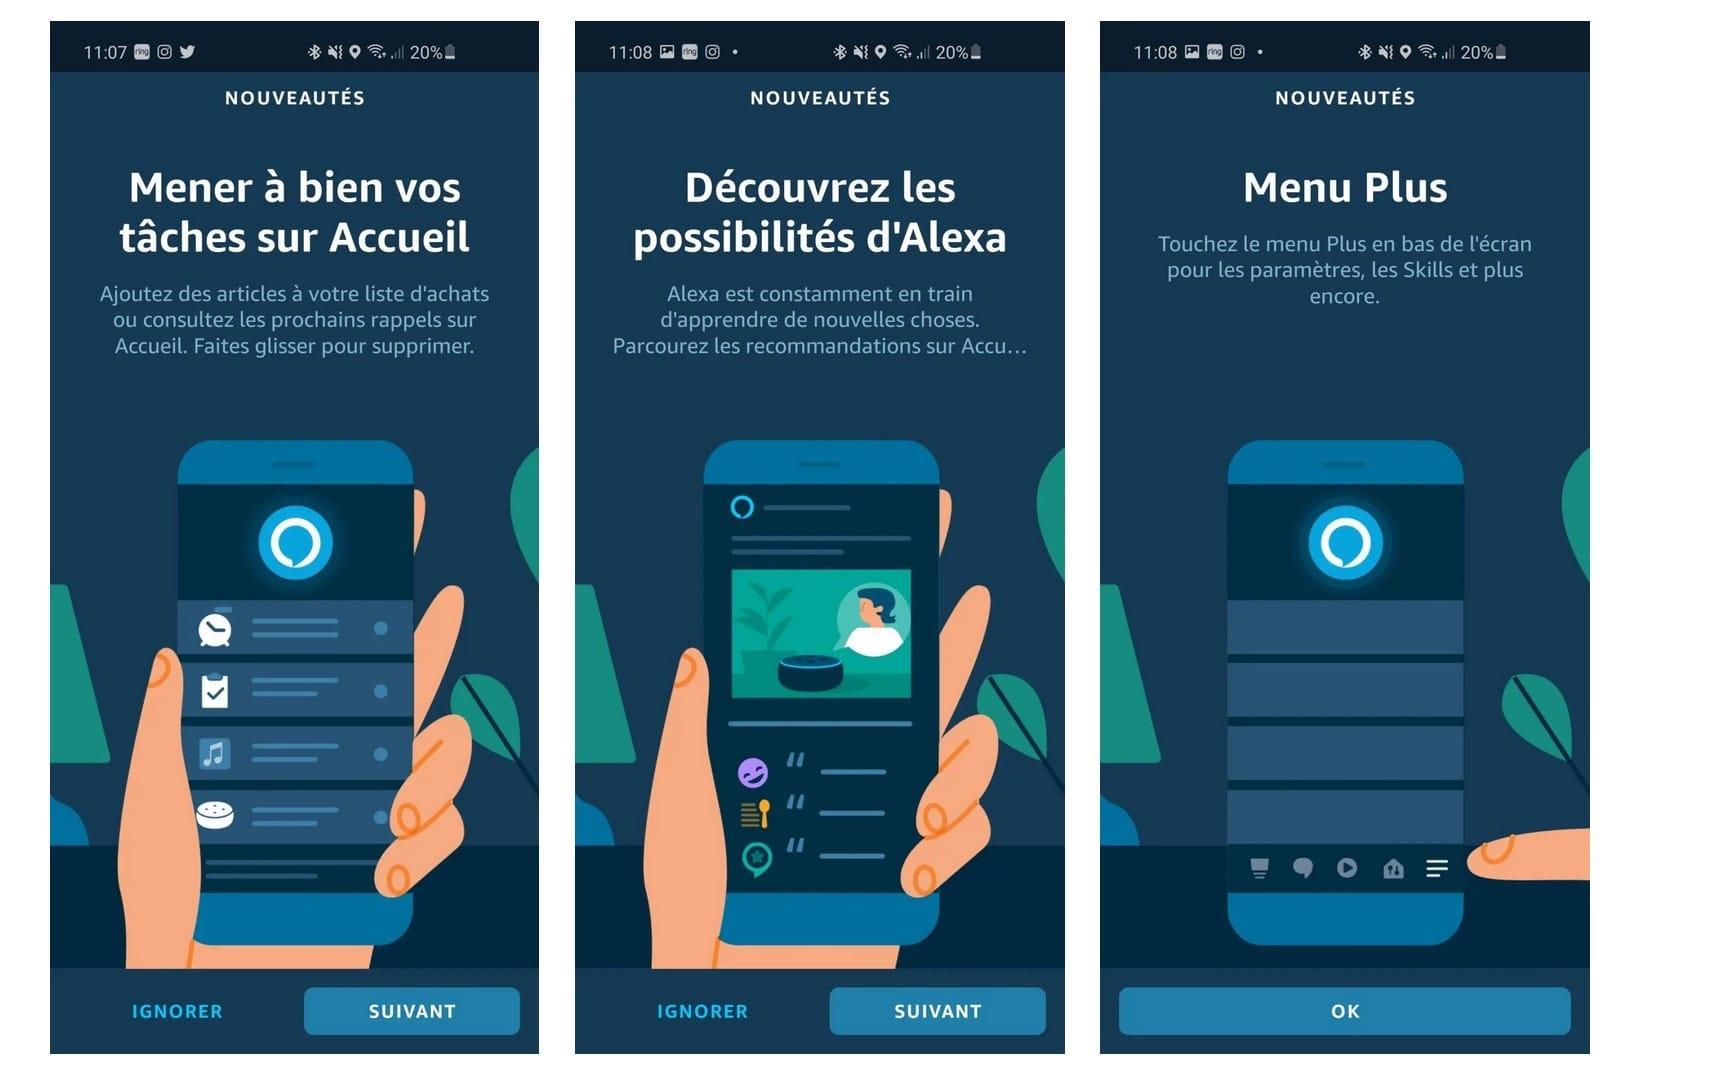 App Alexa nouveautés juillet 2020